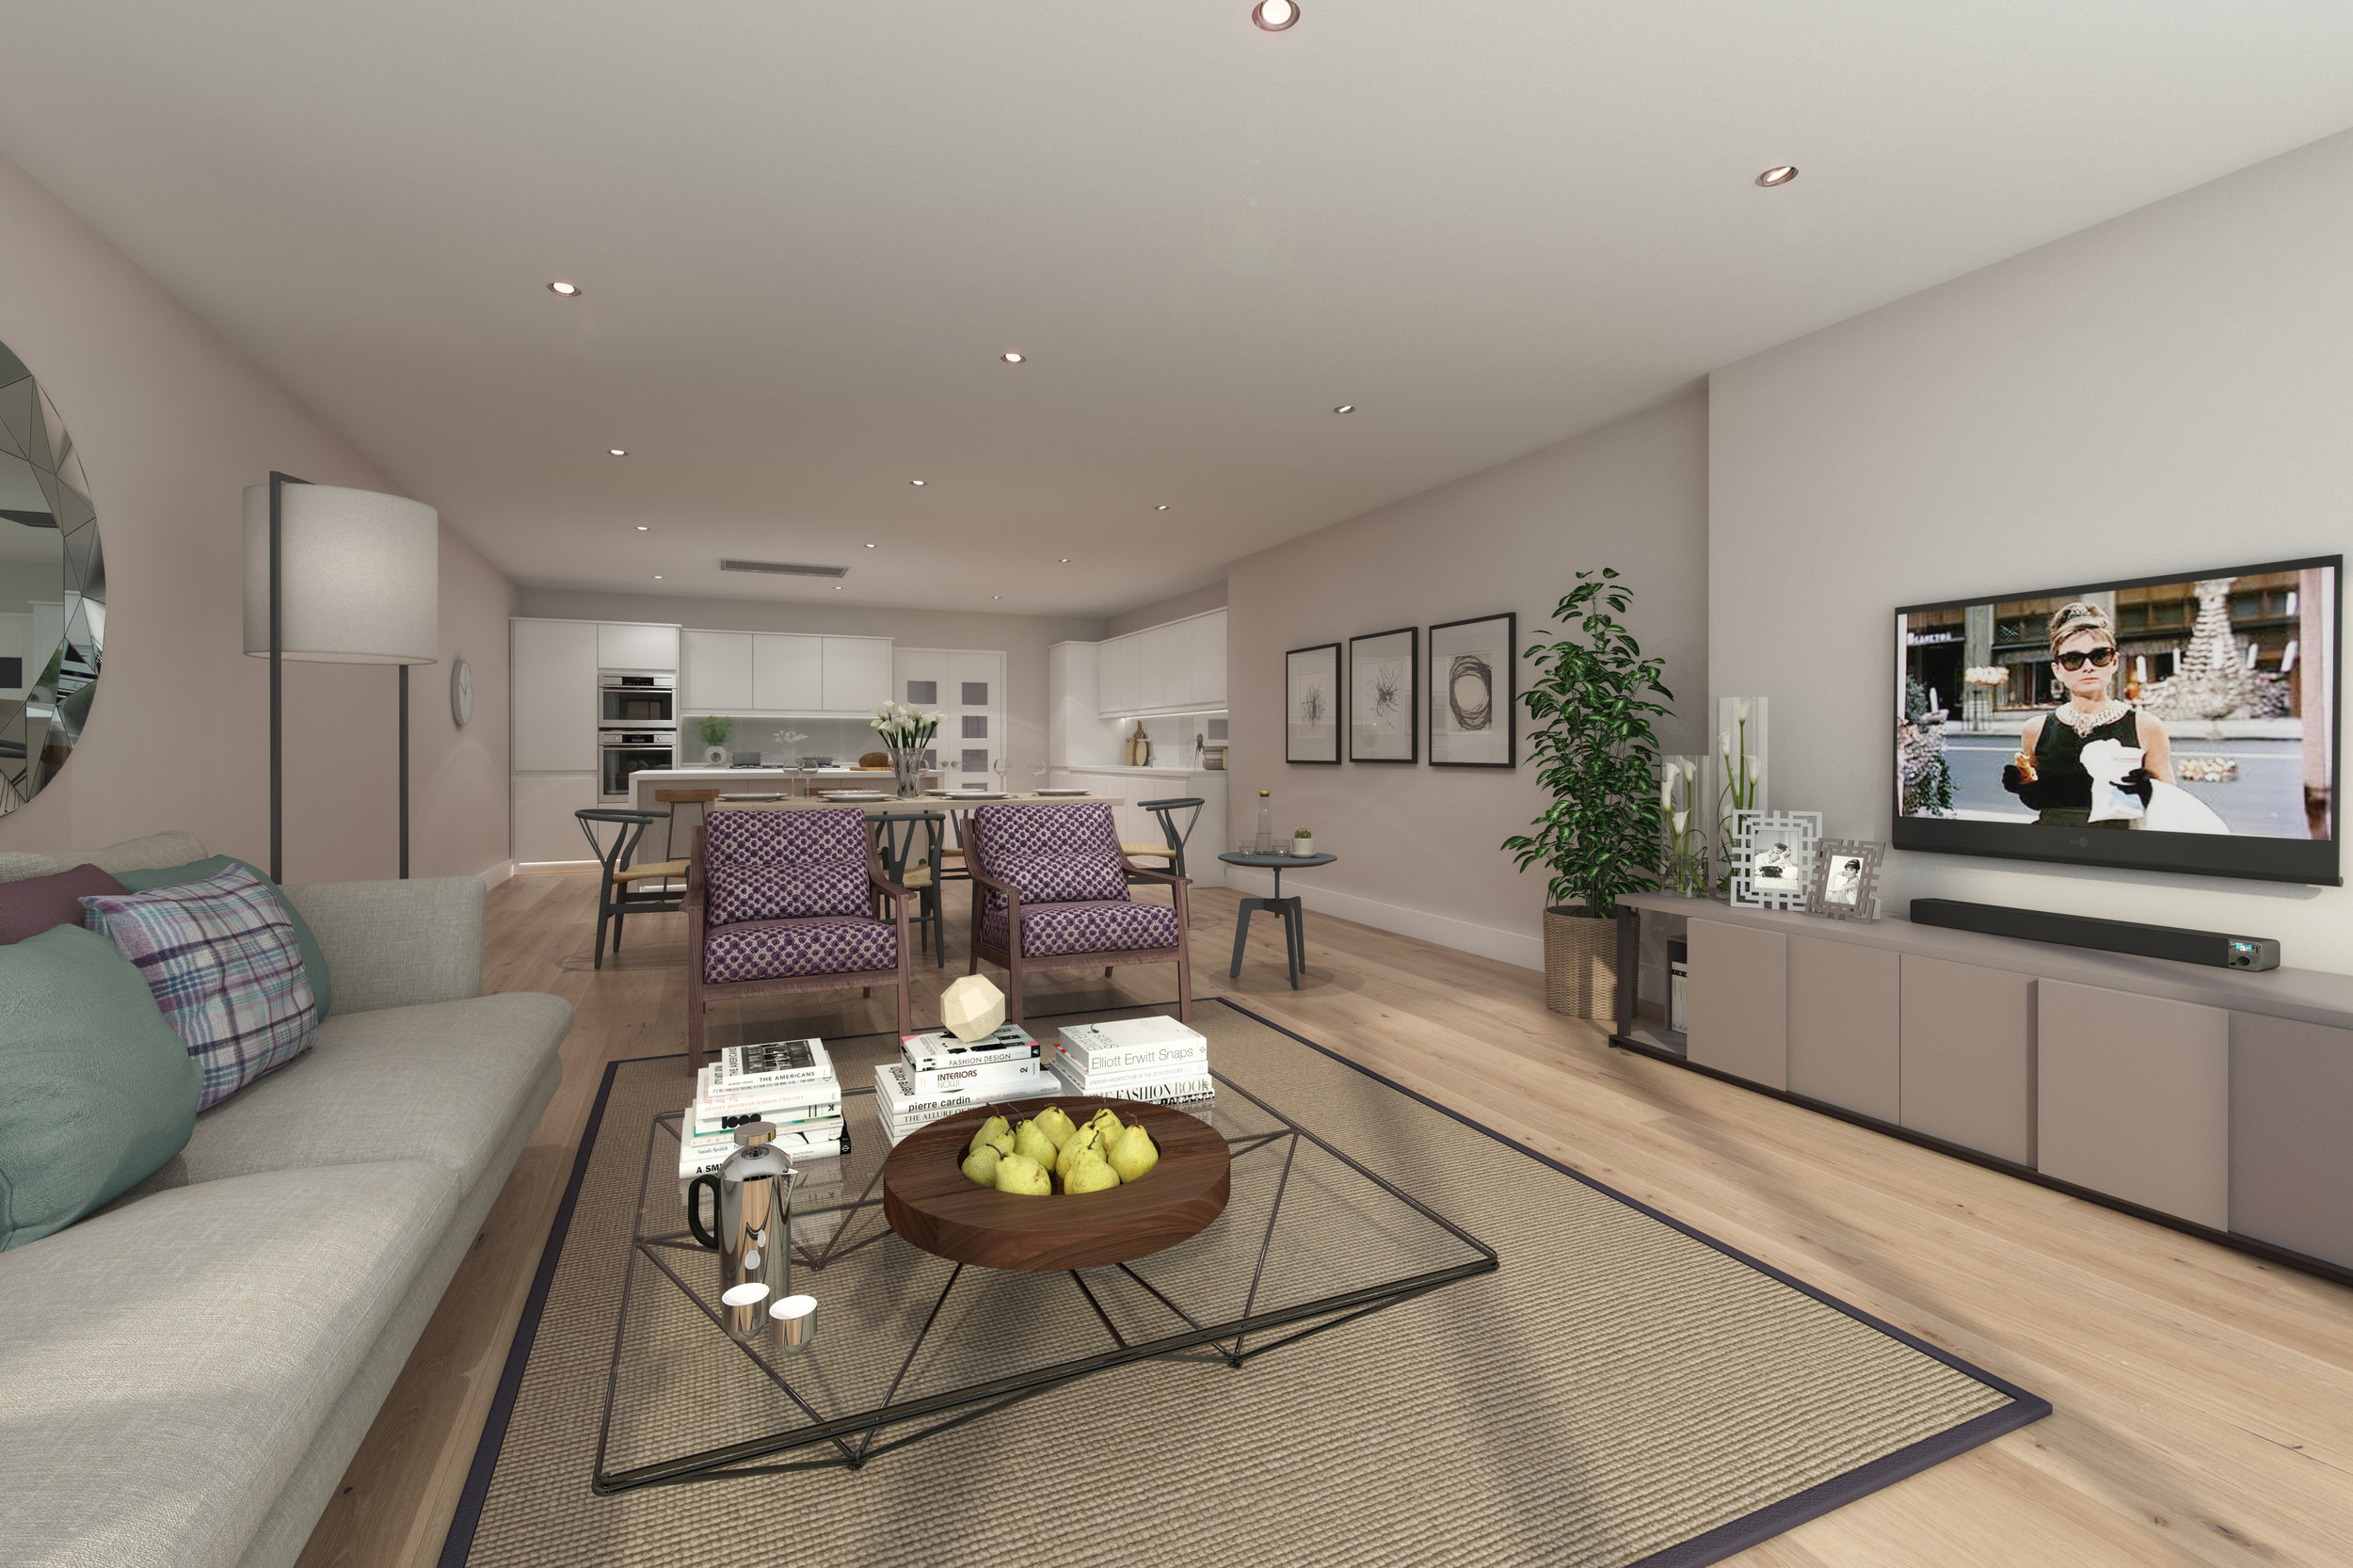 Spenfield_House_New_Build_Interior_01.jpg